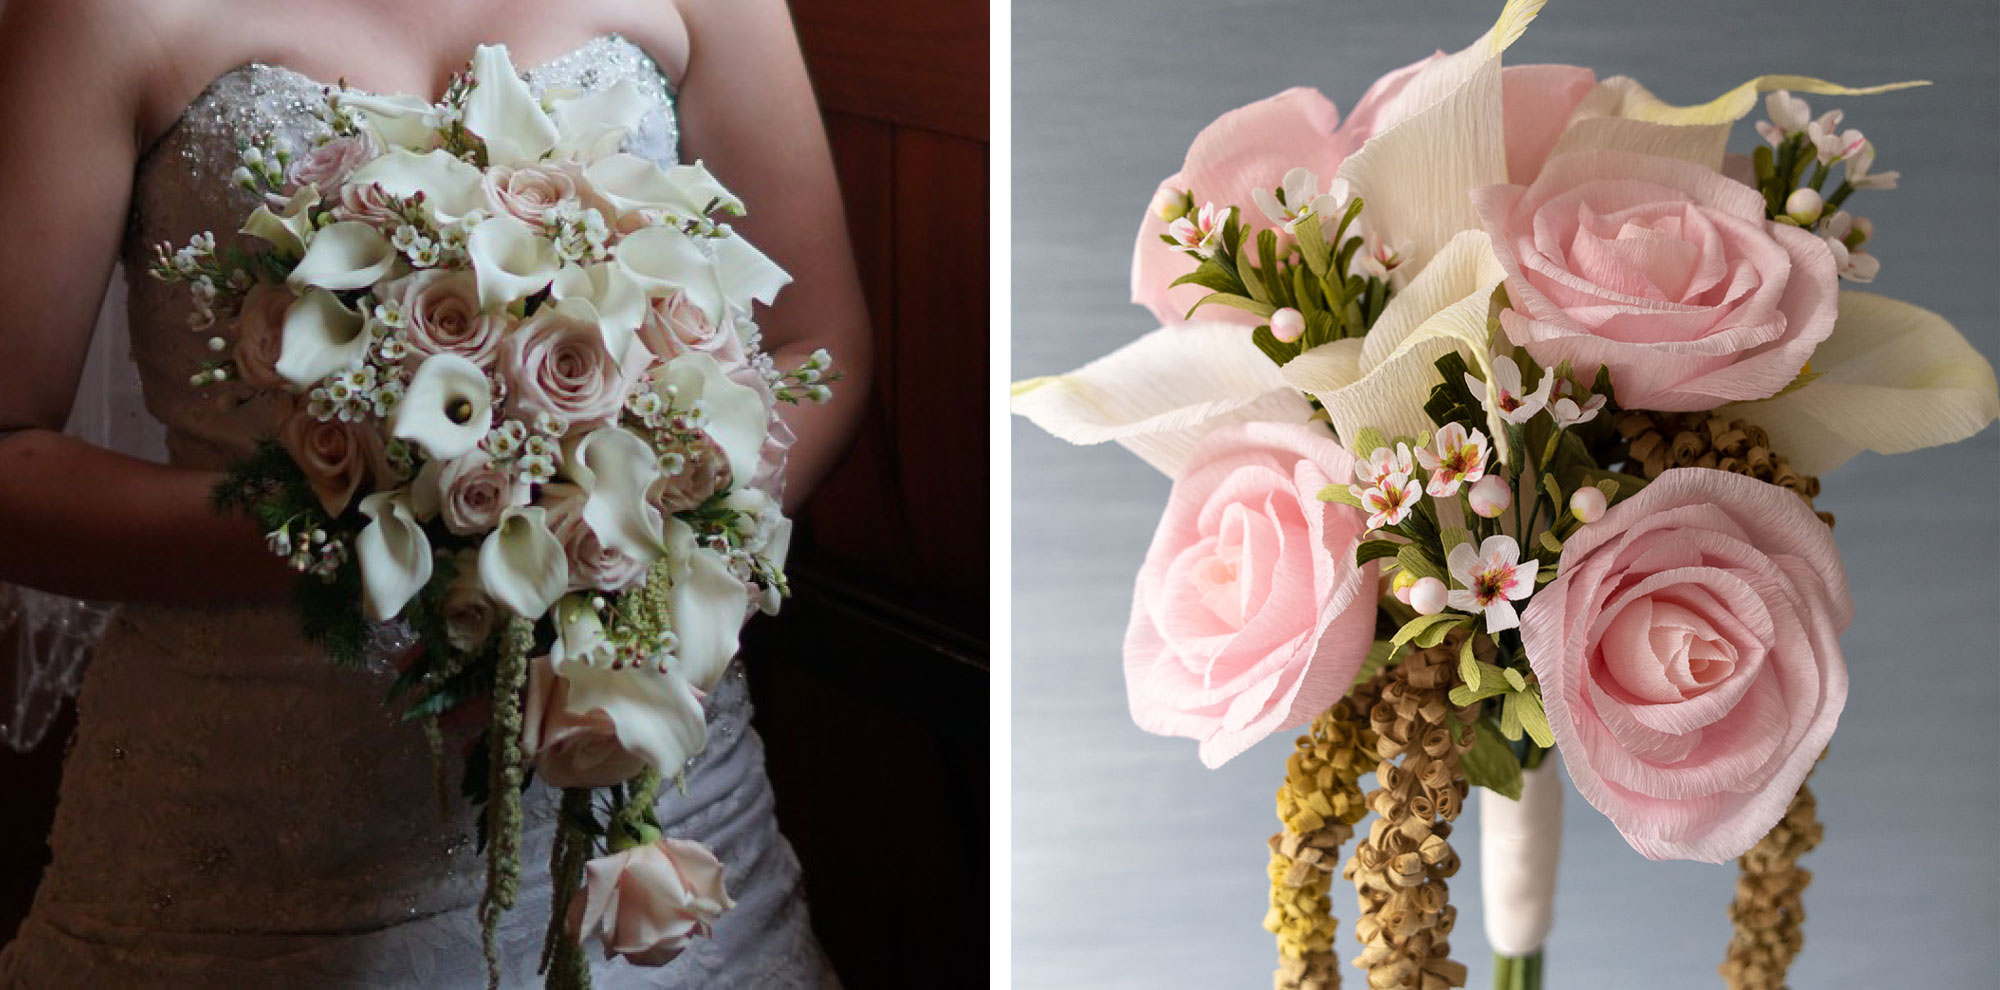 Paper Rose Co wedding bouquet replica comparison